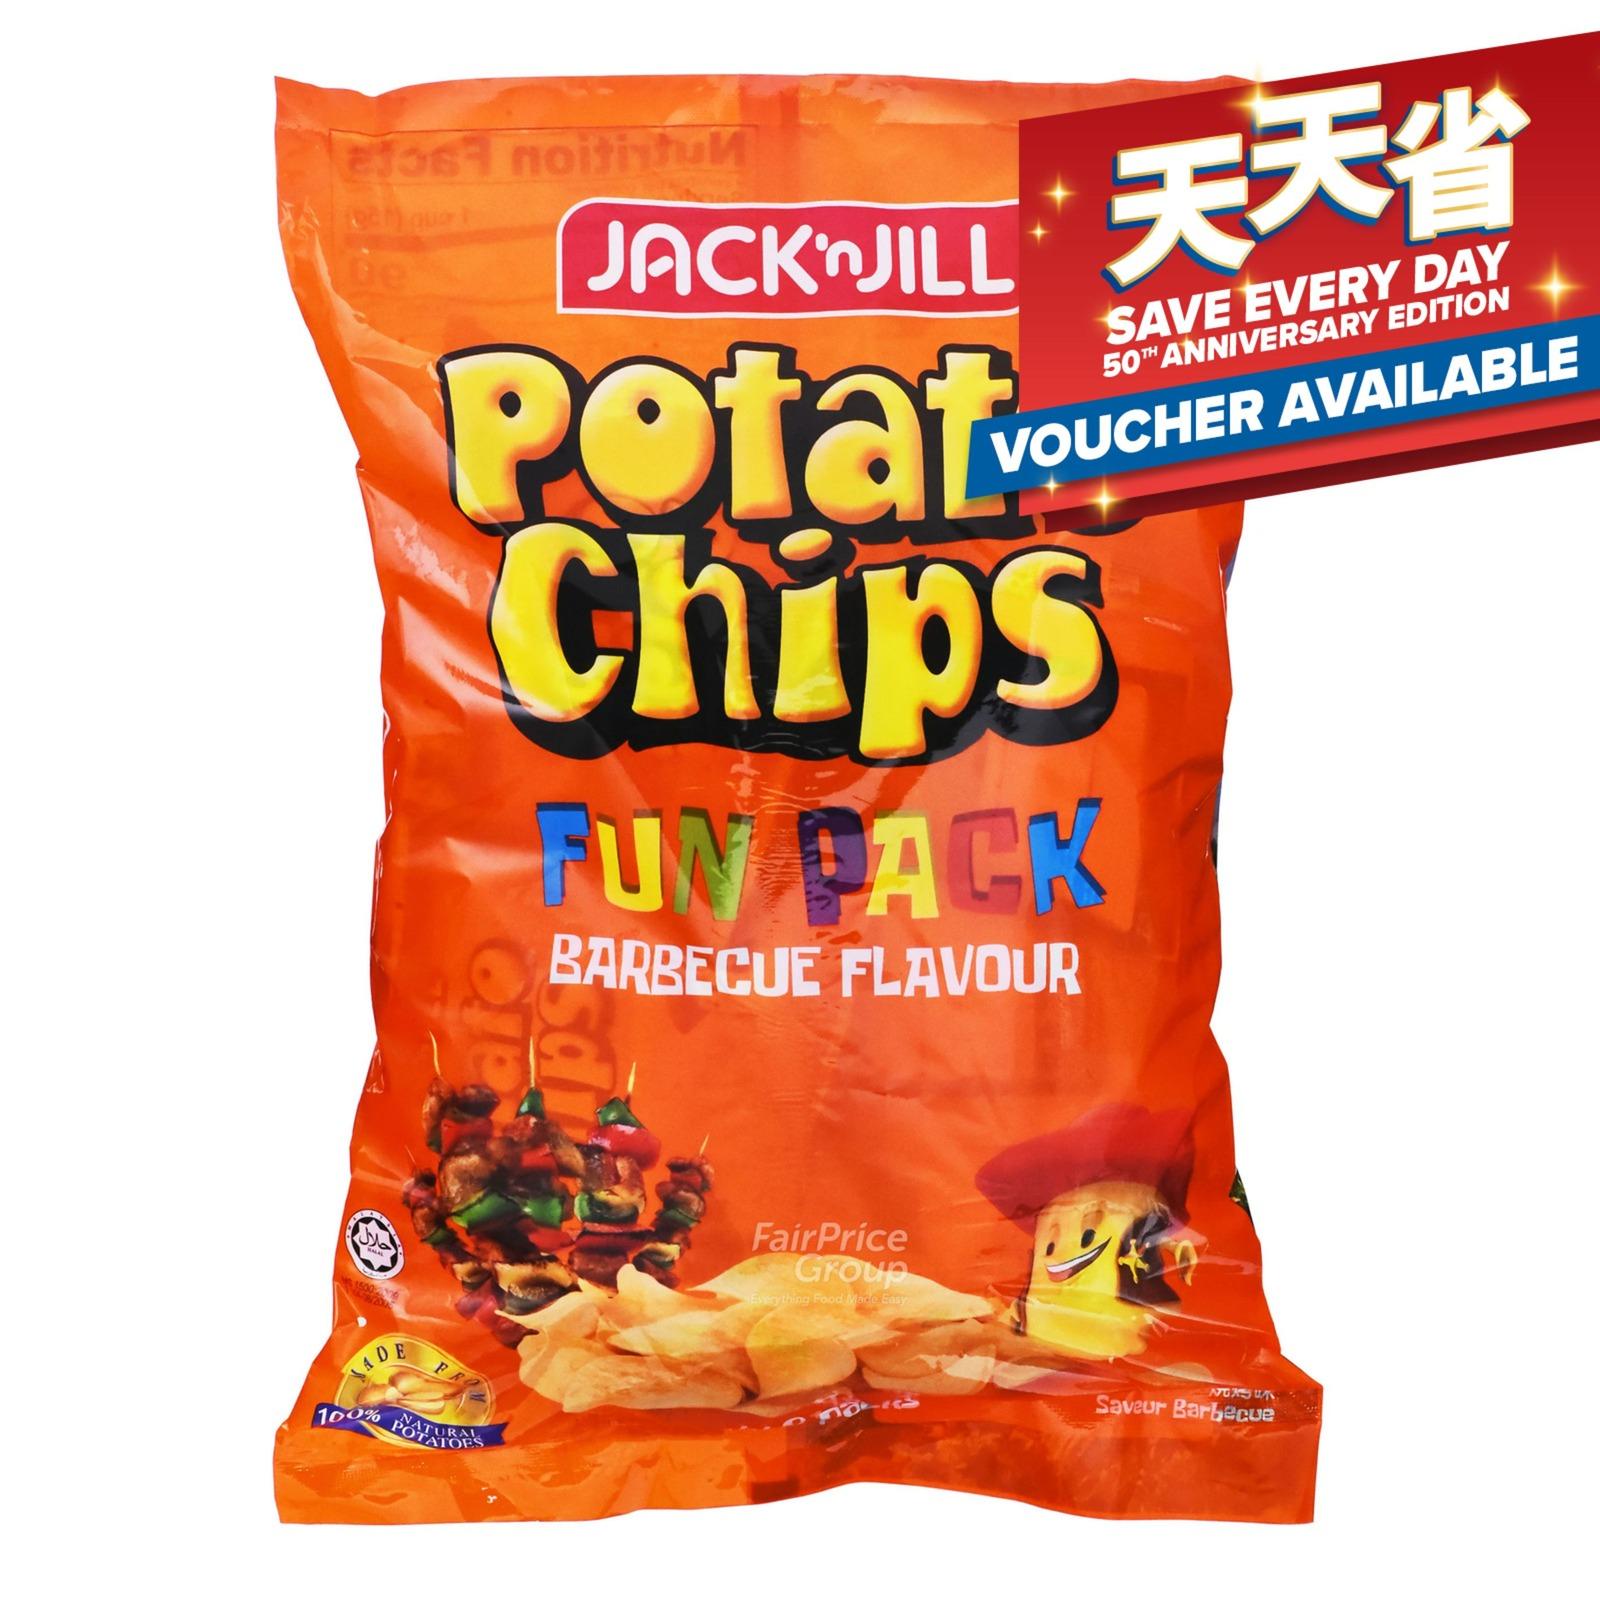 Jack 'n Jill Potato Chips - Barbecue (Funpack)